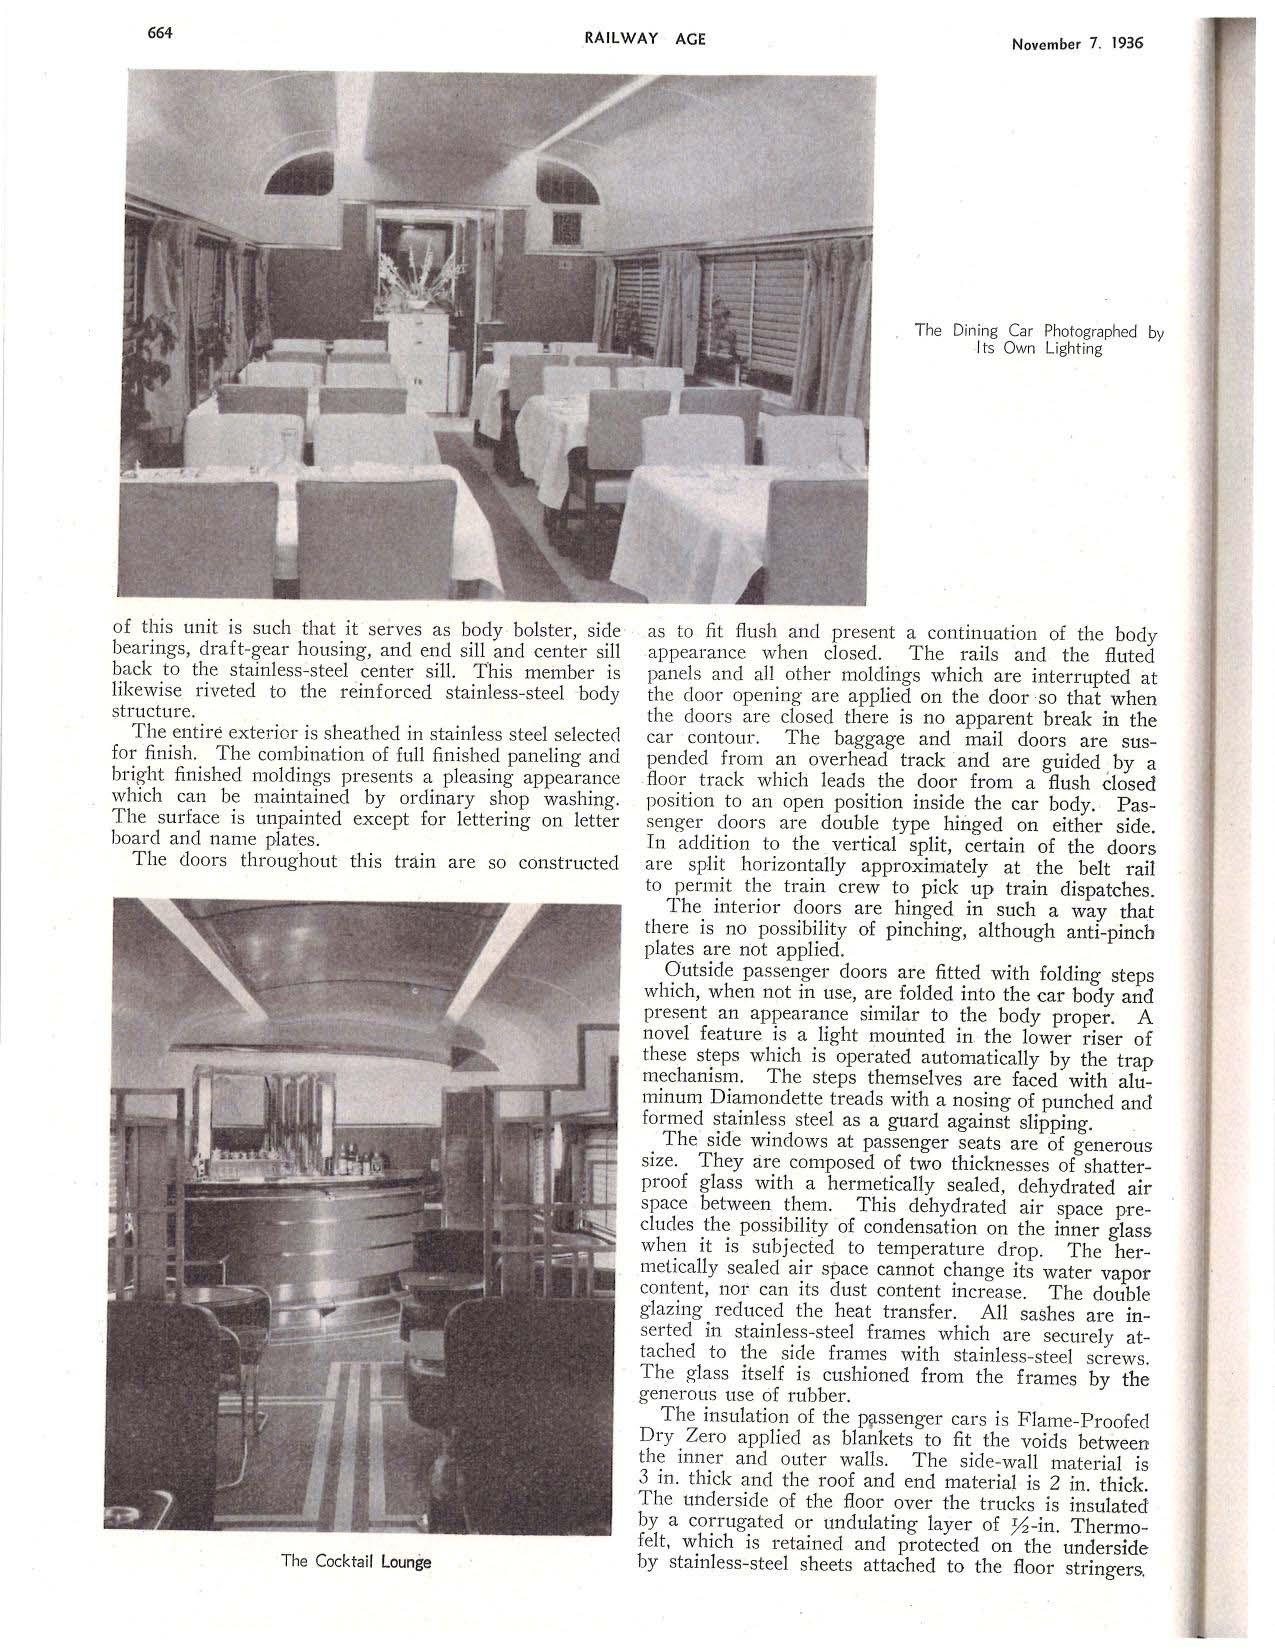 1936+Railway+Age+Article+-+Compressed 7.jpg